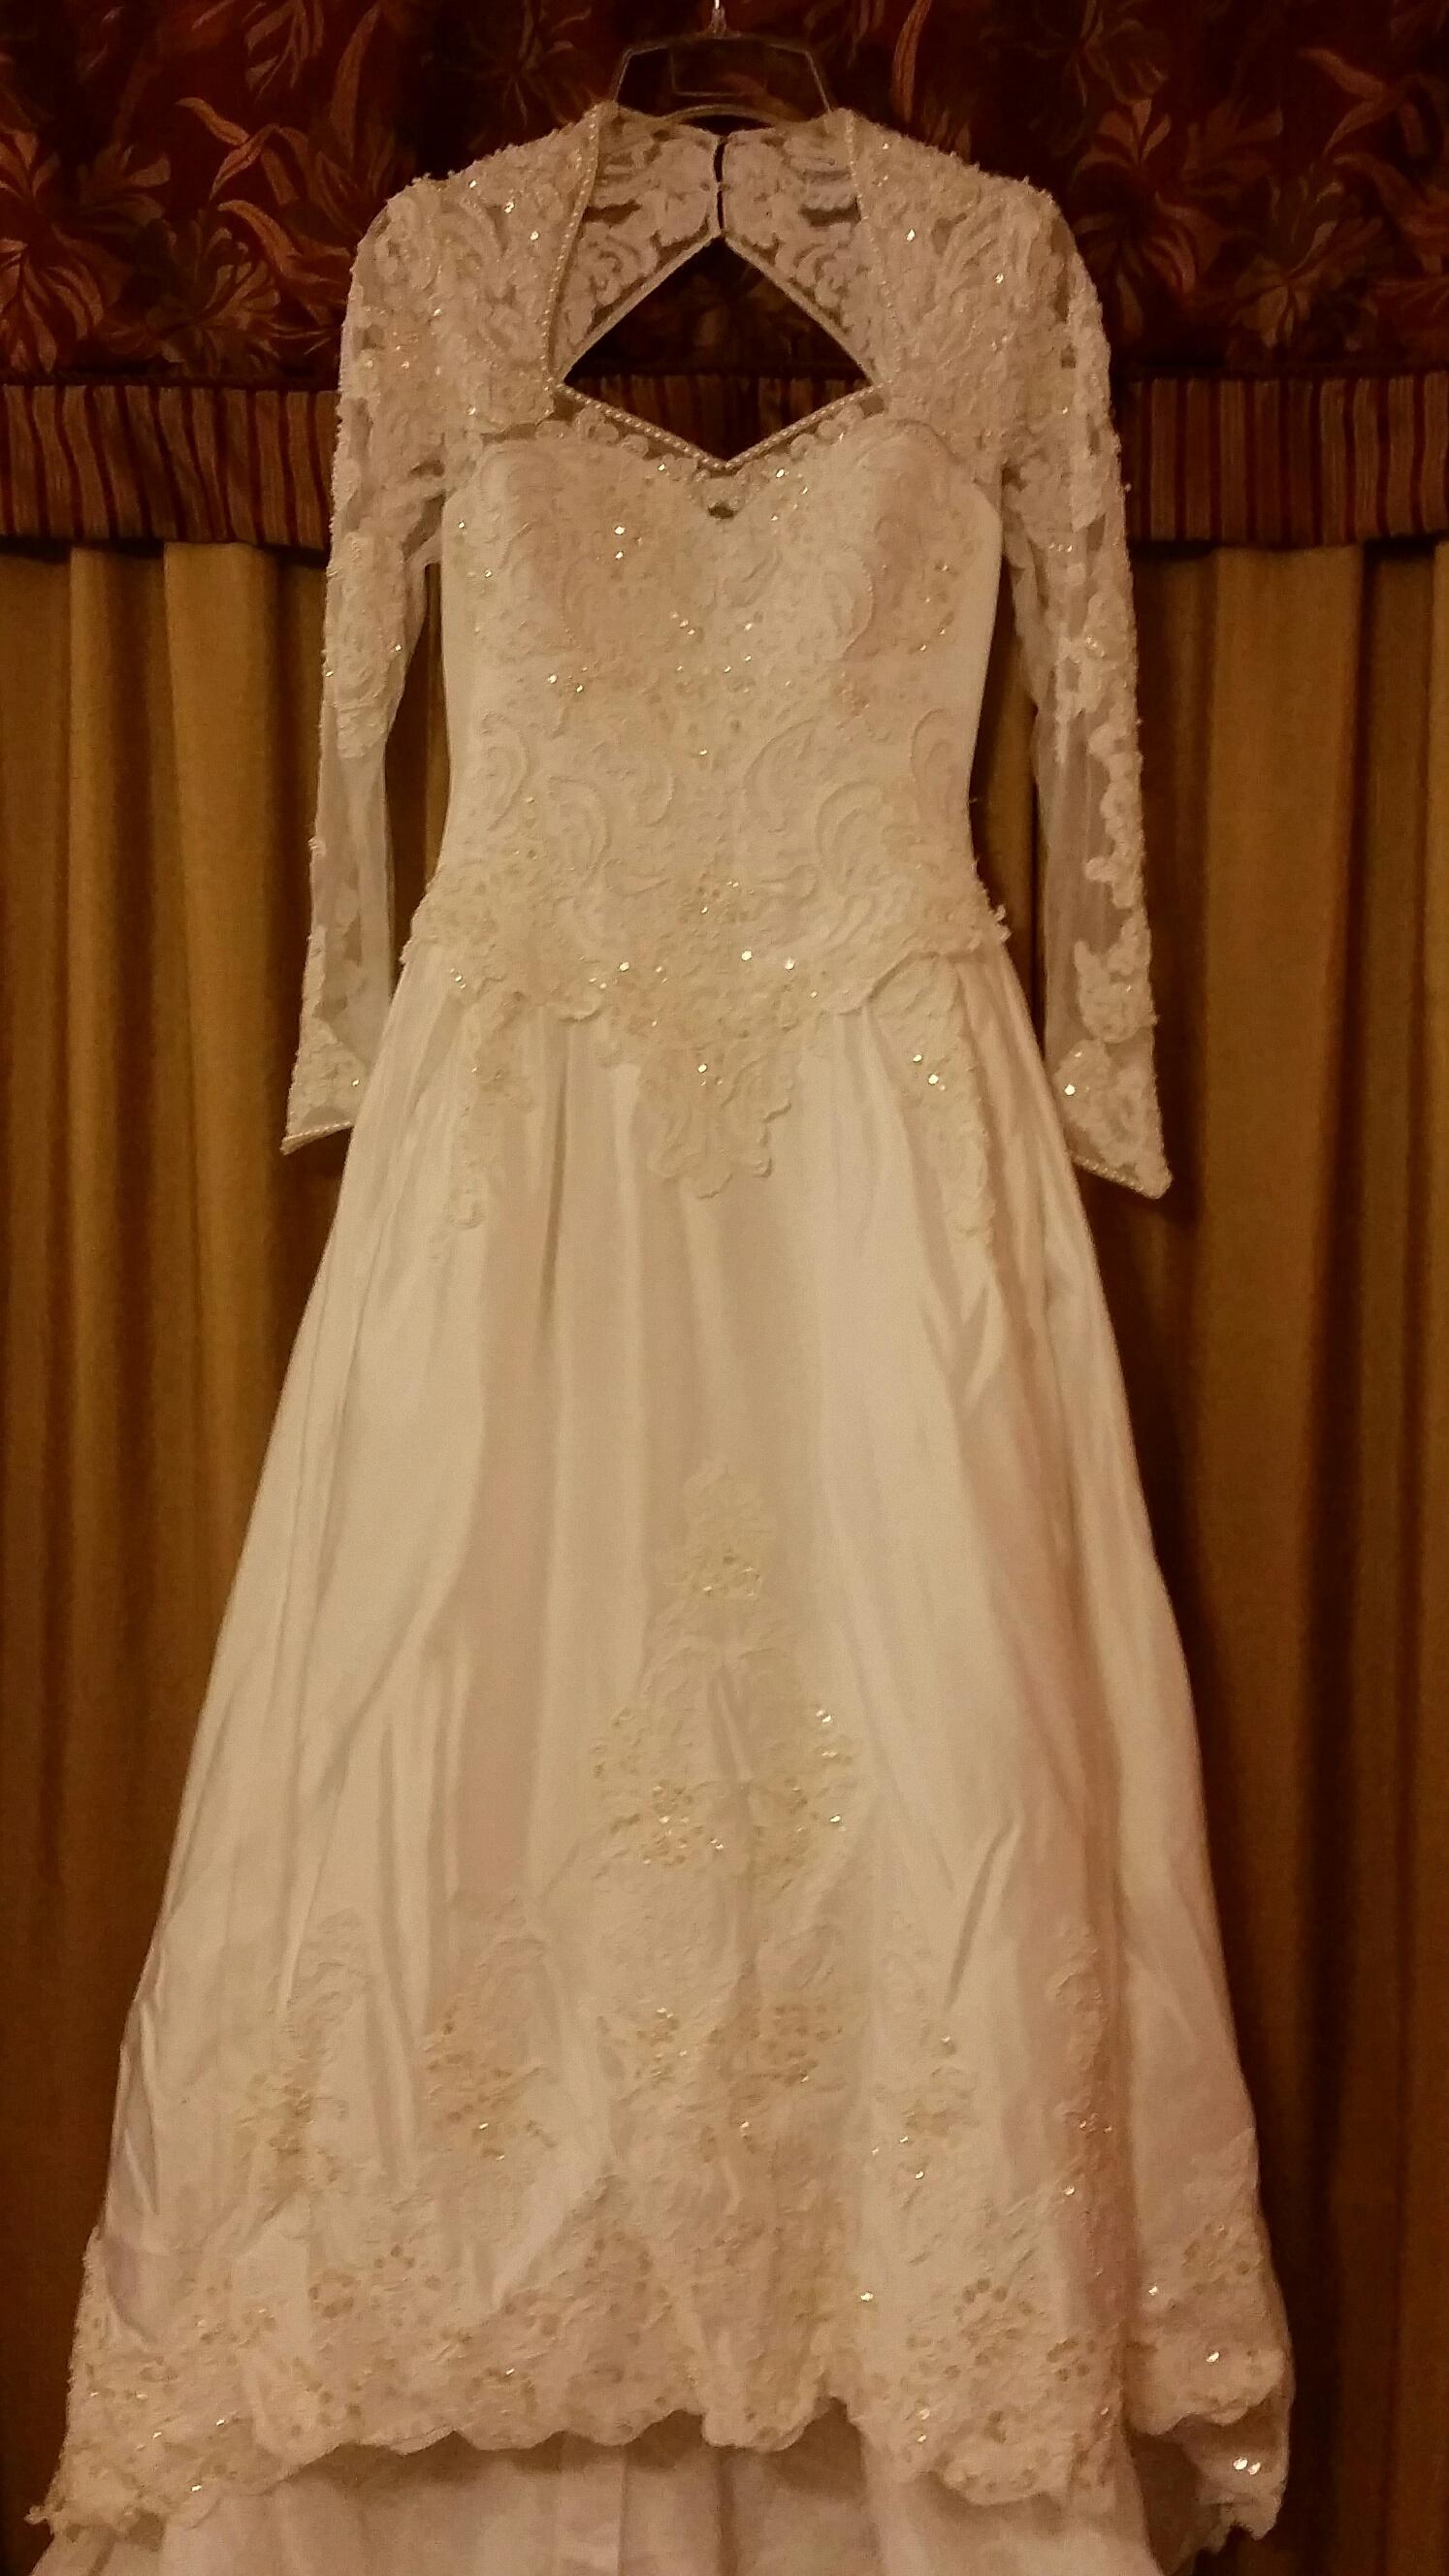 Moonlight second hand wedding dress on sale 75 off for Second hand wedding dresses for sale